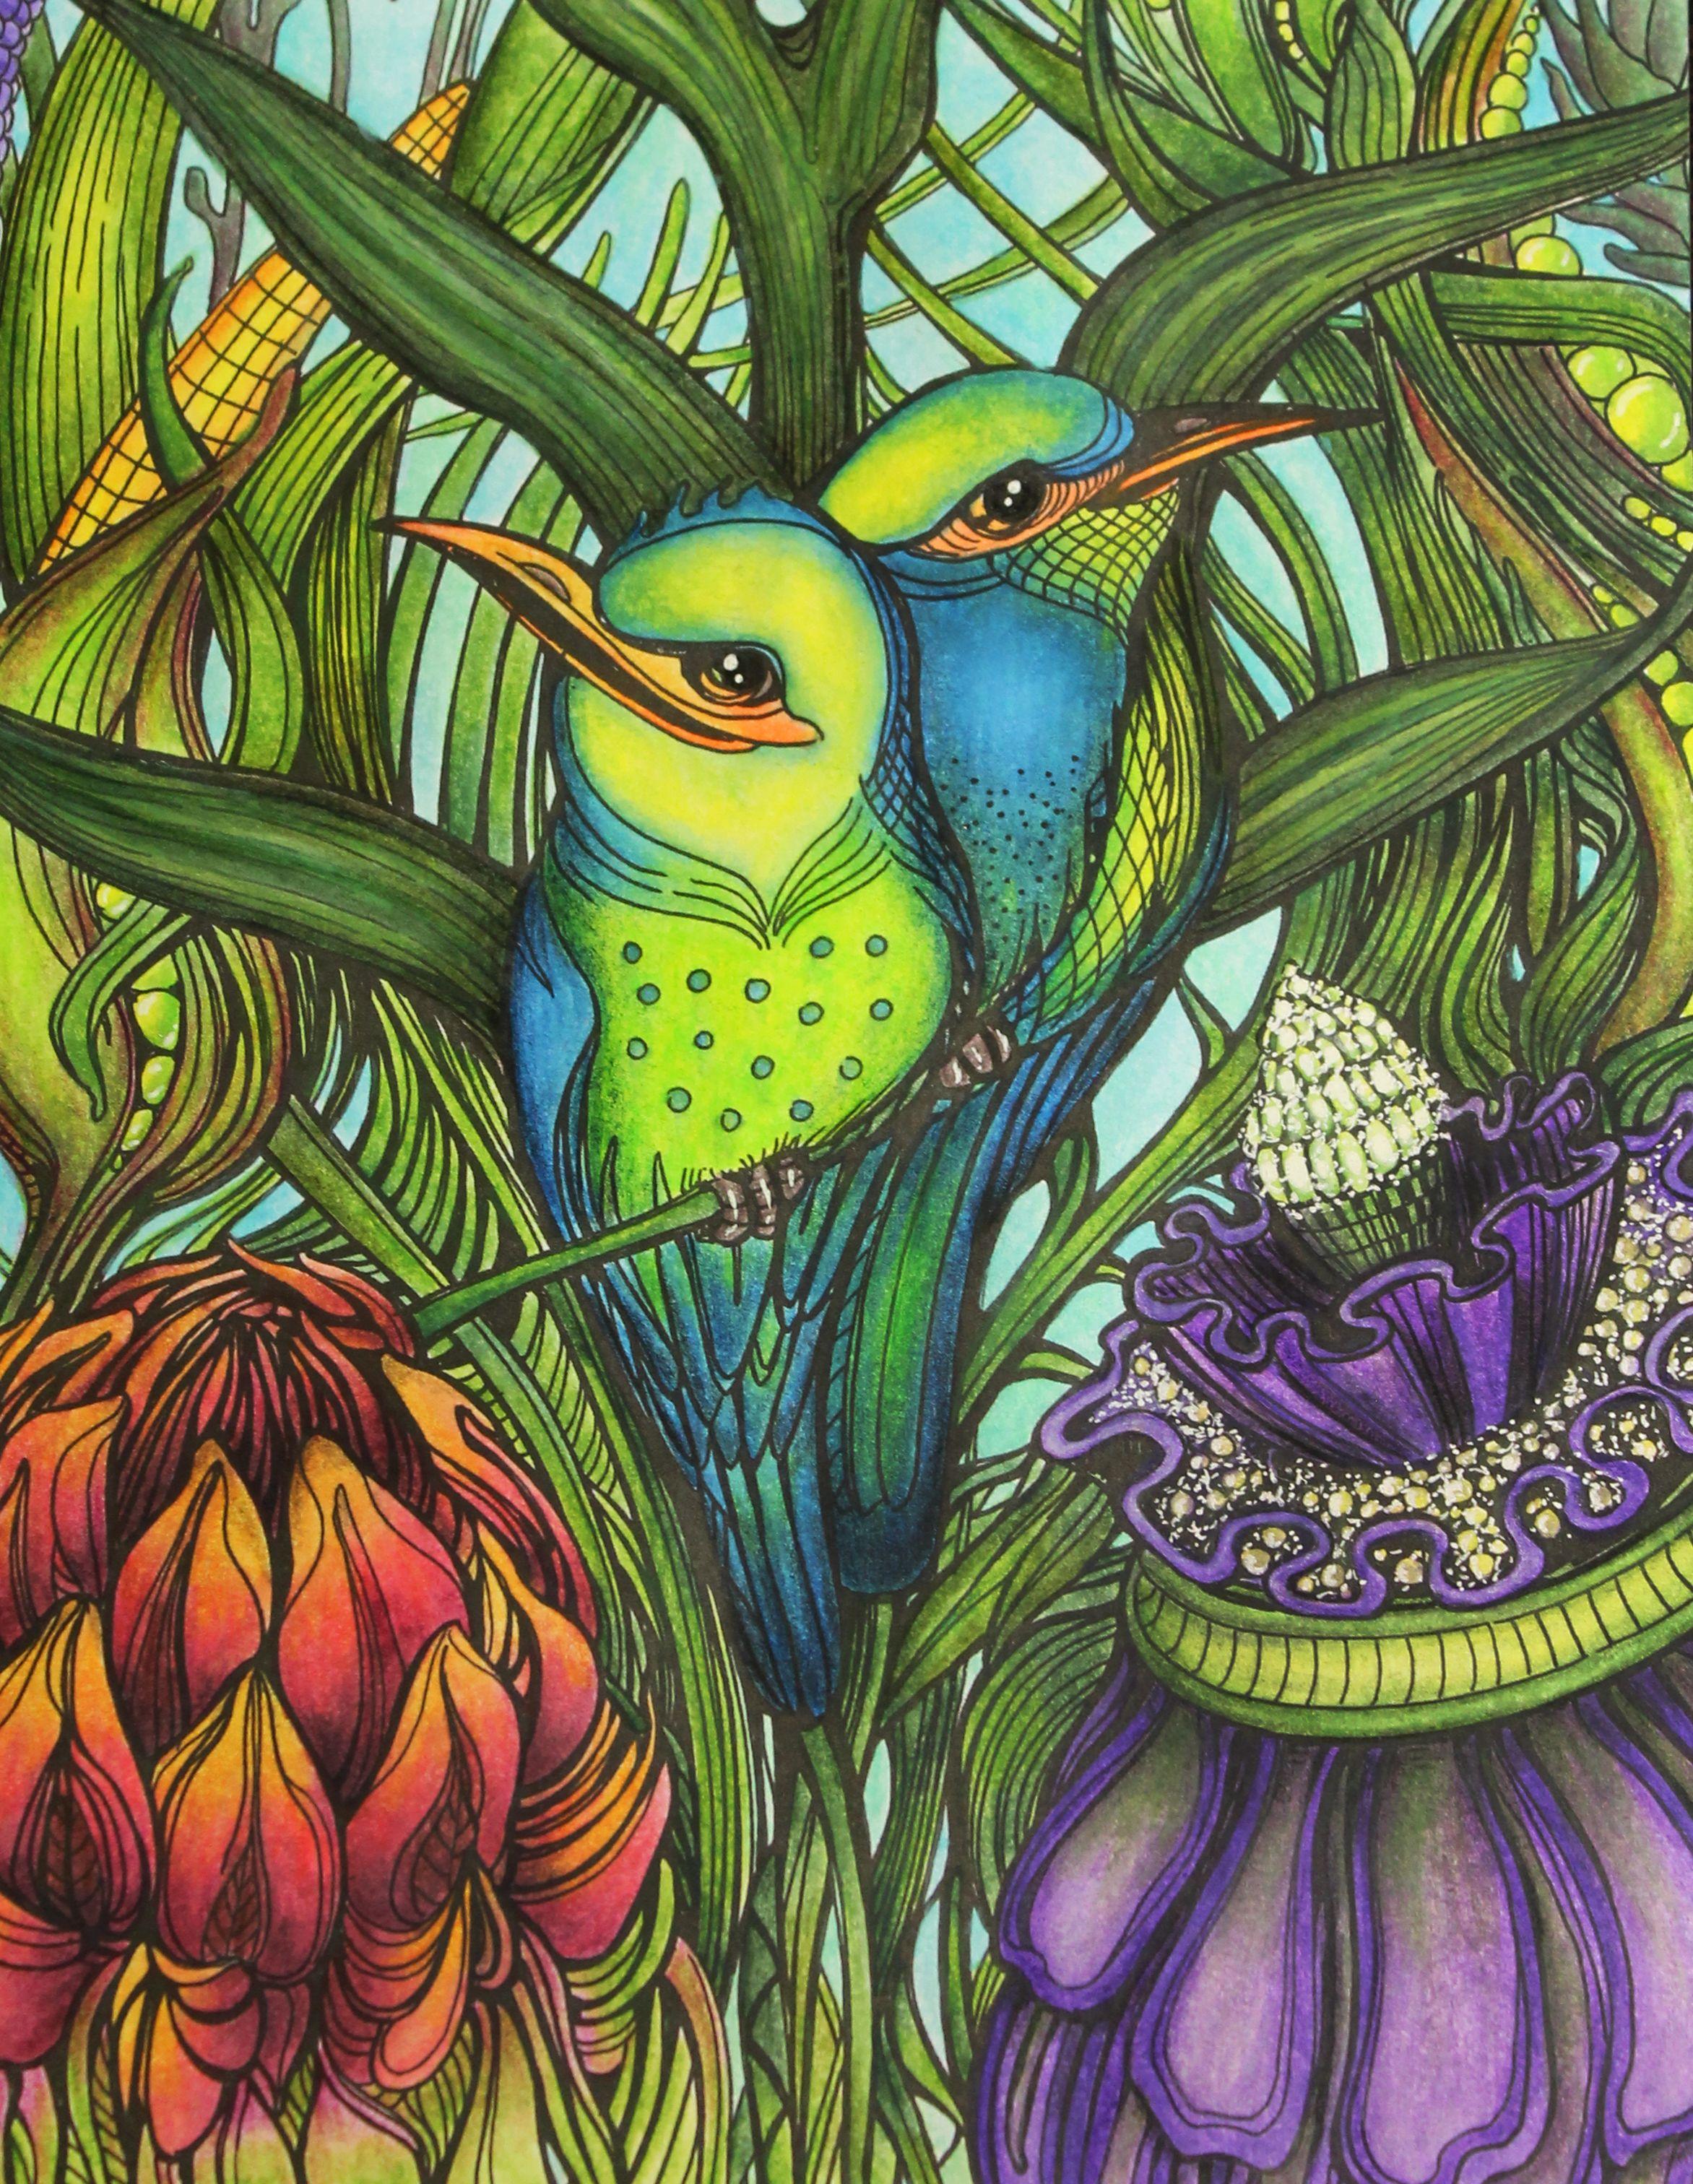 Manic Botanic Christmas Coloring Books Vinyl Record Art Coloring Books